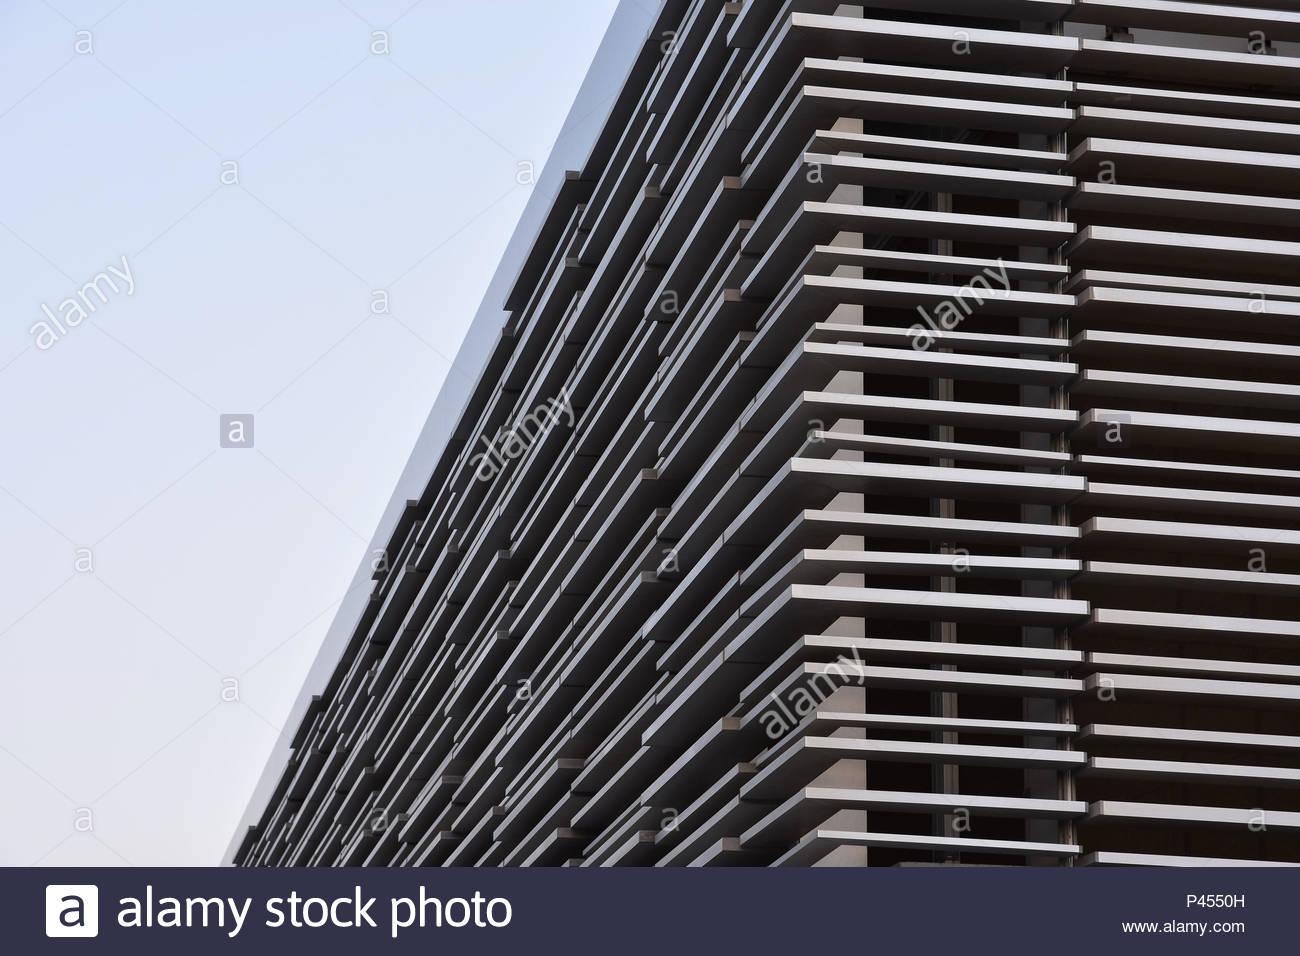 Modern facade steel cladding architectural elements detail